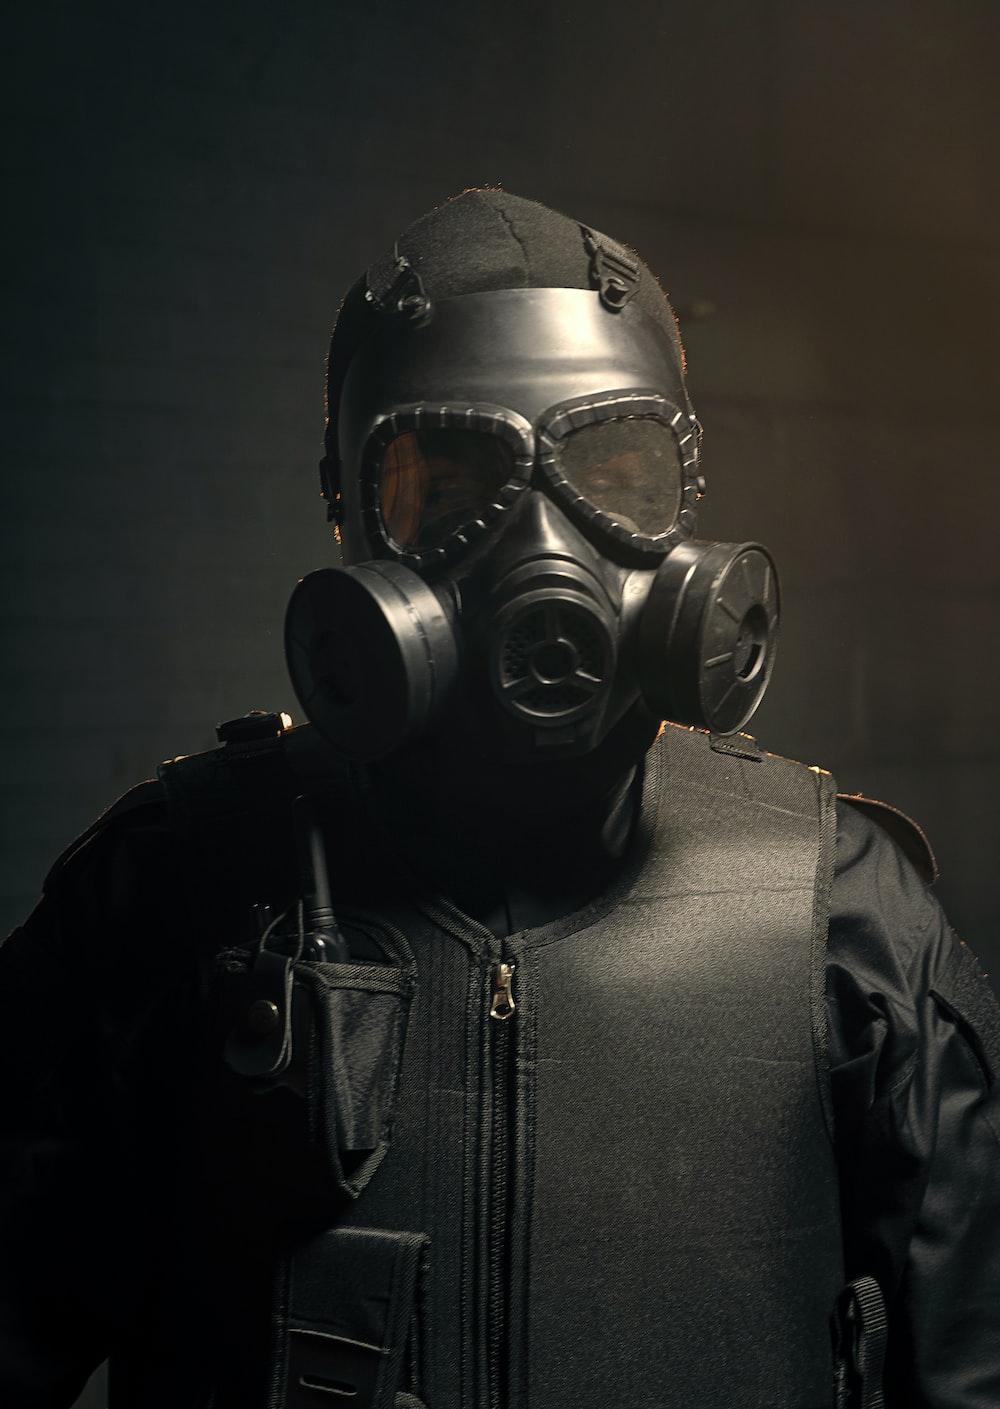 man in black leather jacket wearing gas mask